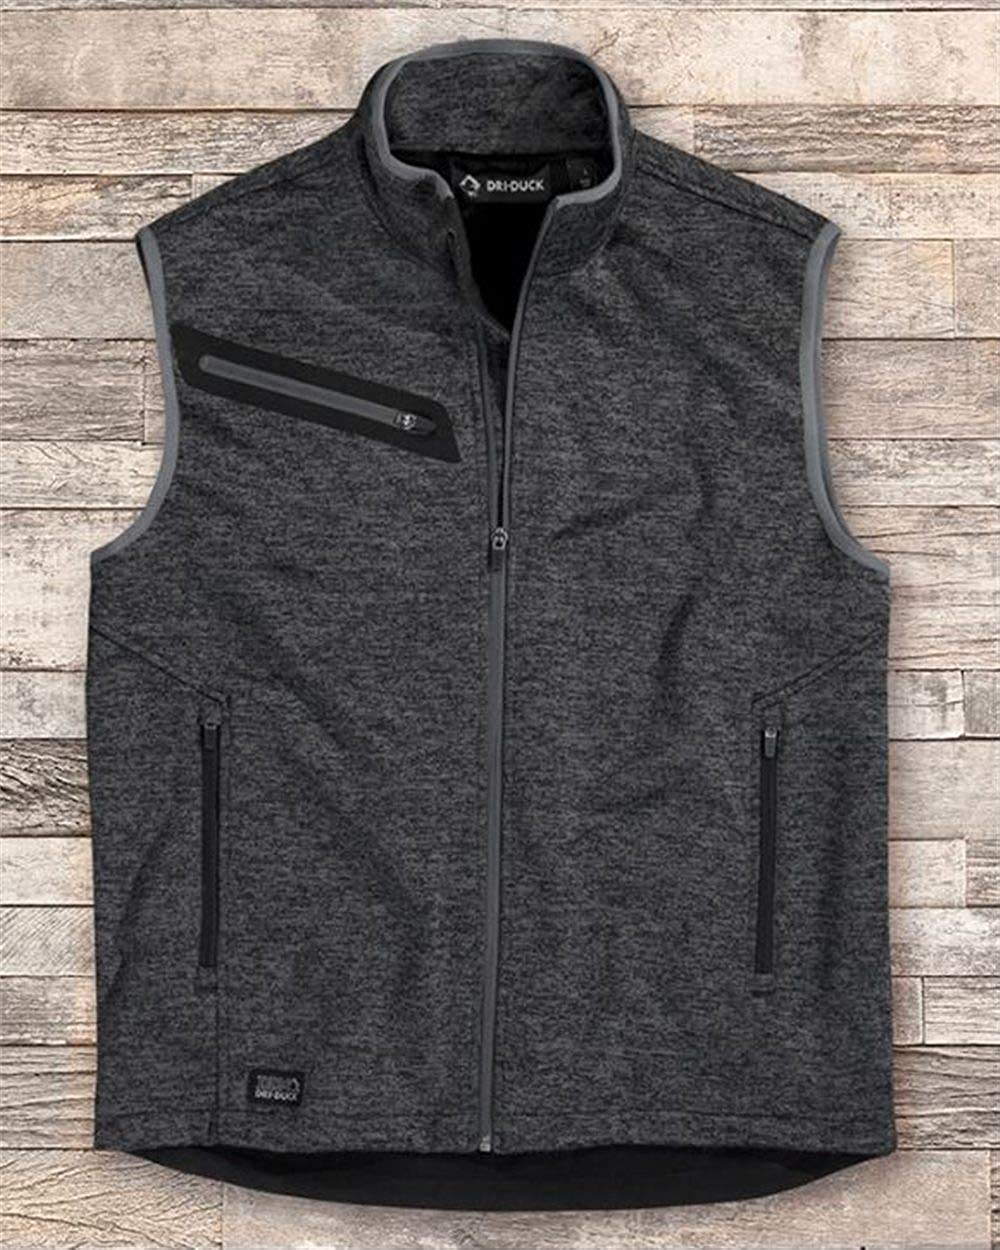 DRI Duck Compass Bonded Mélange Sweater Fleece Vest - Charcoal - S